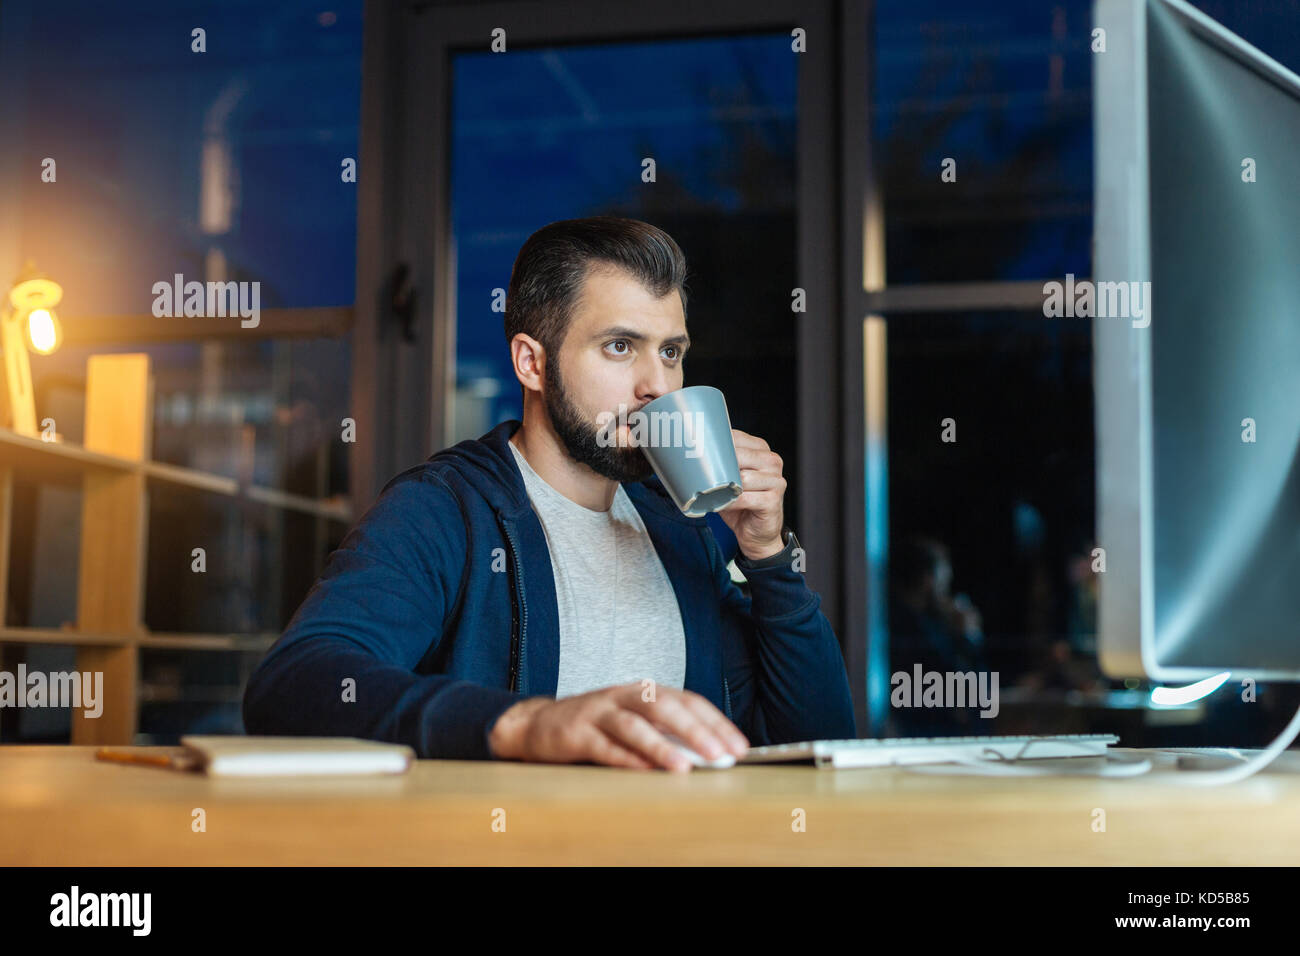 Attraktive Brünette trinken heißen Tee Stockbild